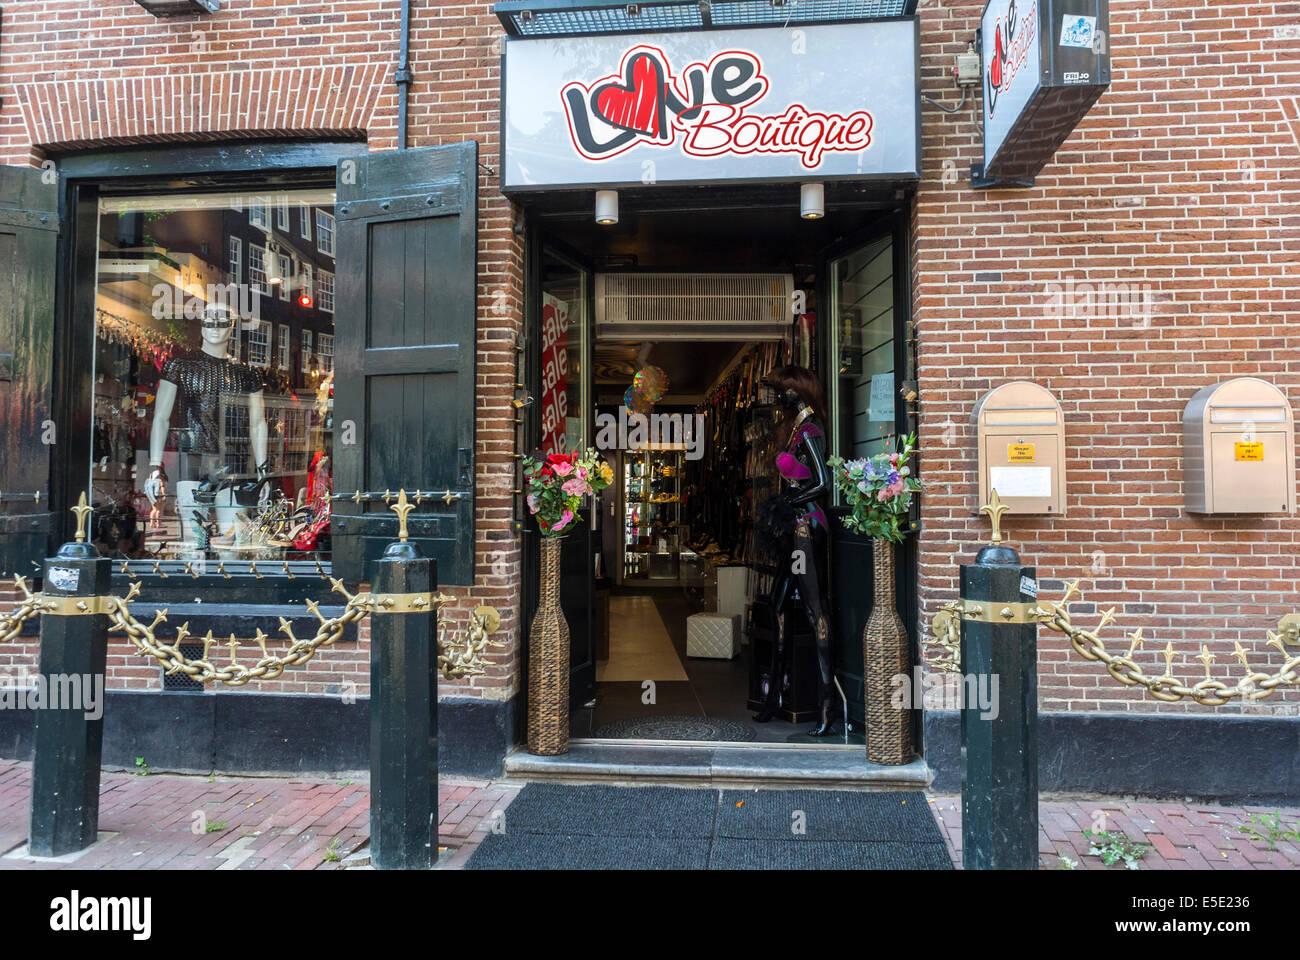 Online adult sex shops